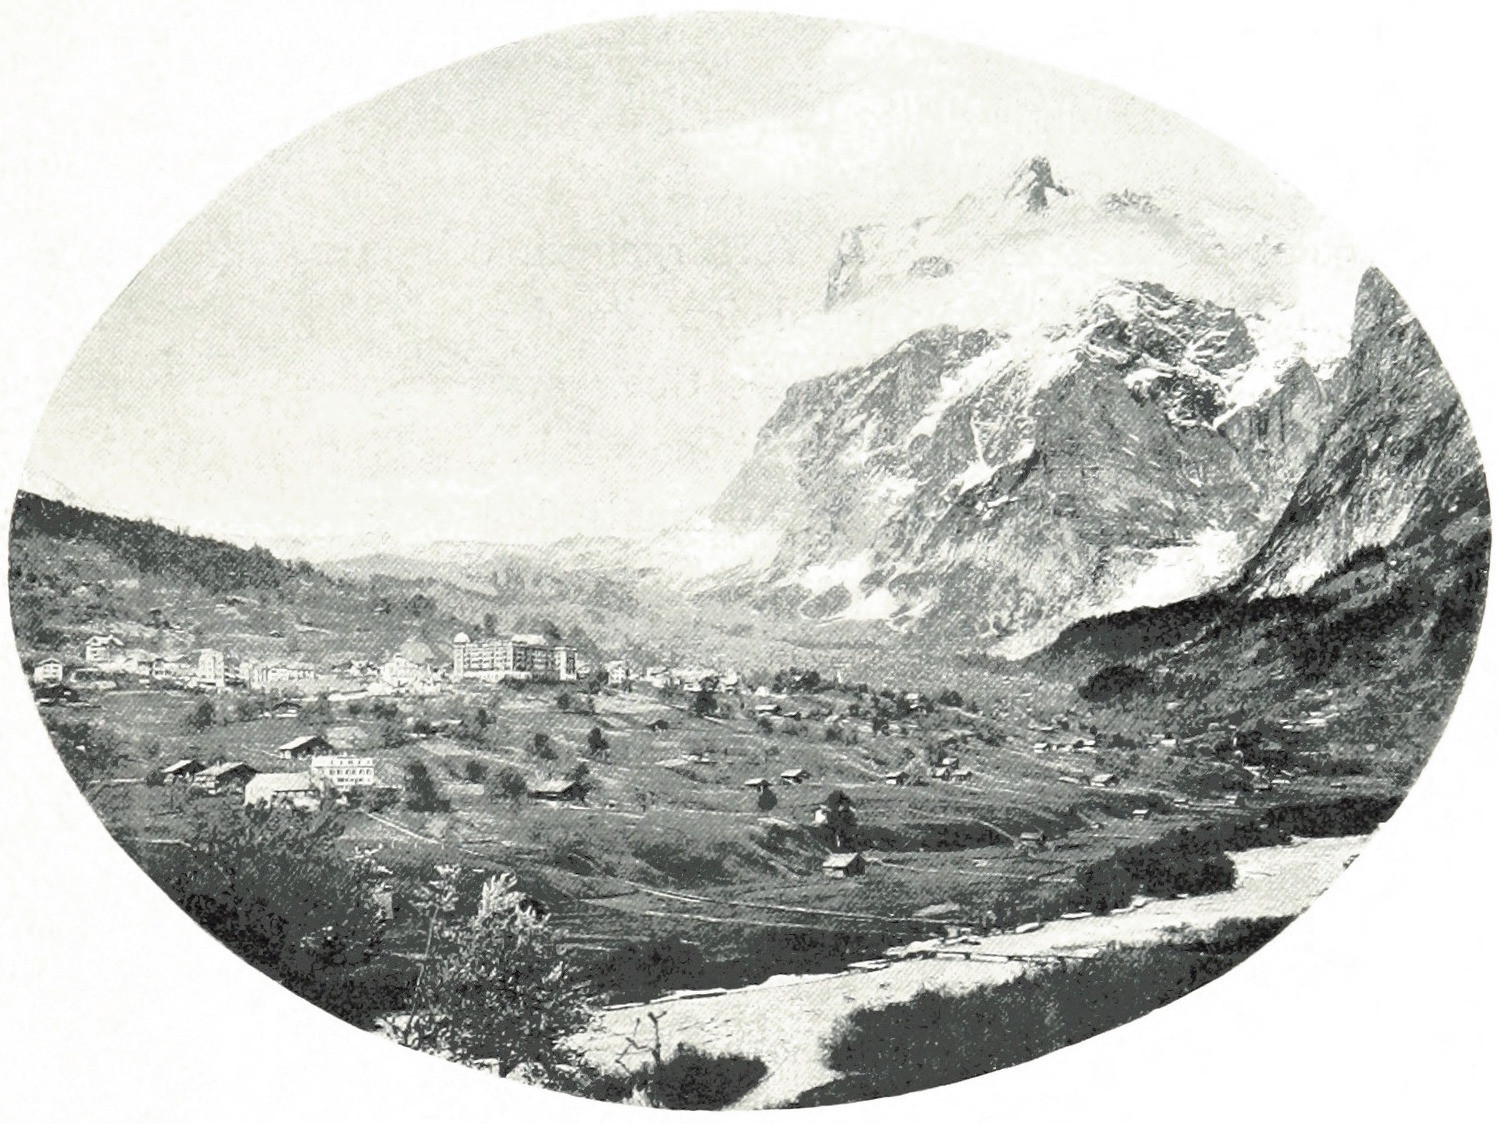 Grindelwald - Wetterhorn par Theodor Wundt, fin XIXe